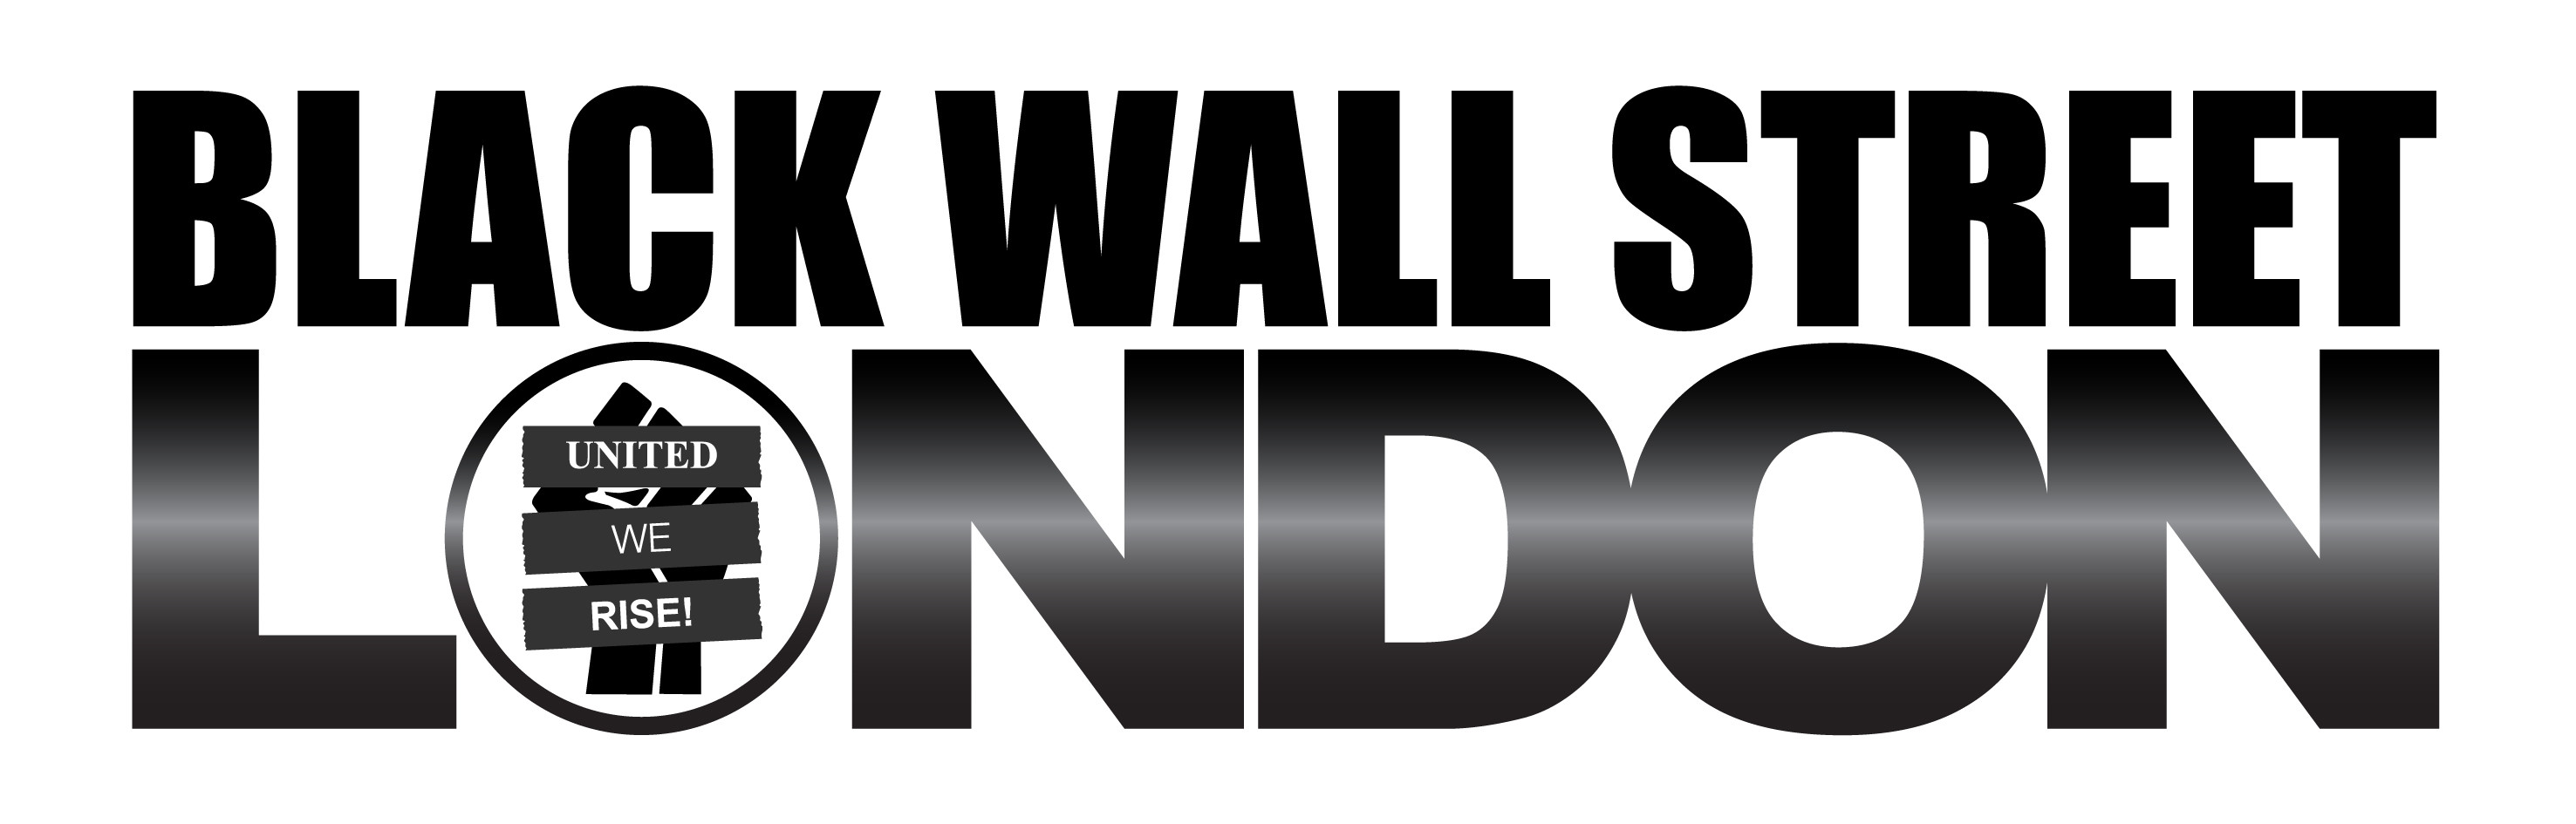 Black Wall Street London